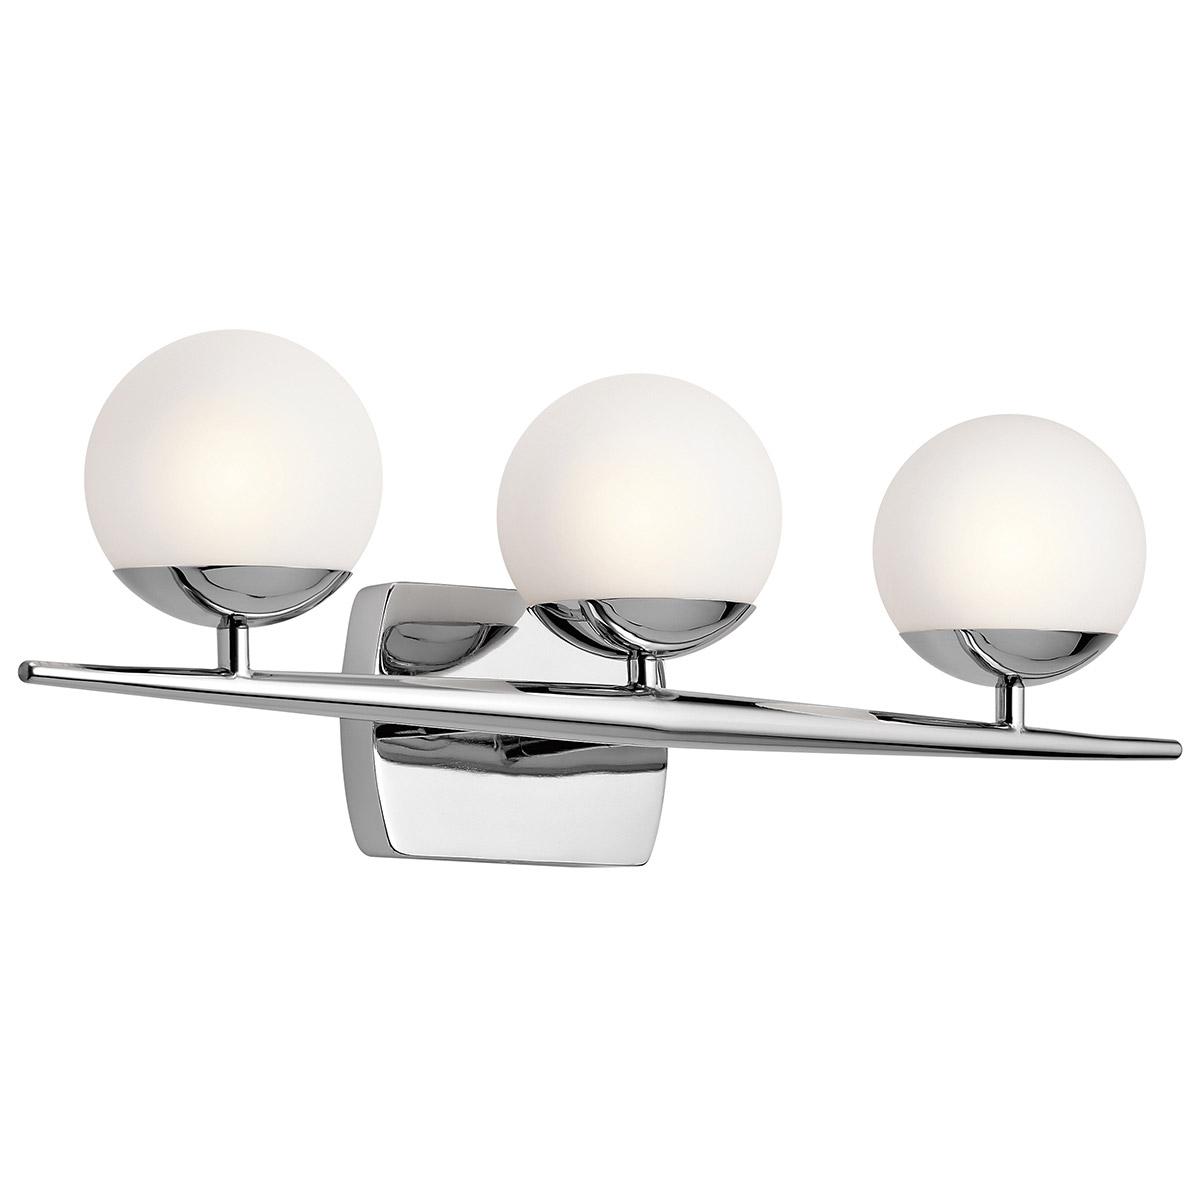 Kichler 45582ch Jasper Halogen Bathroom Vanity Light